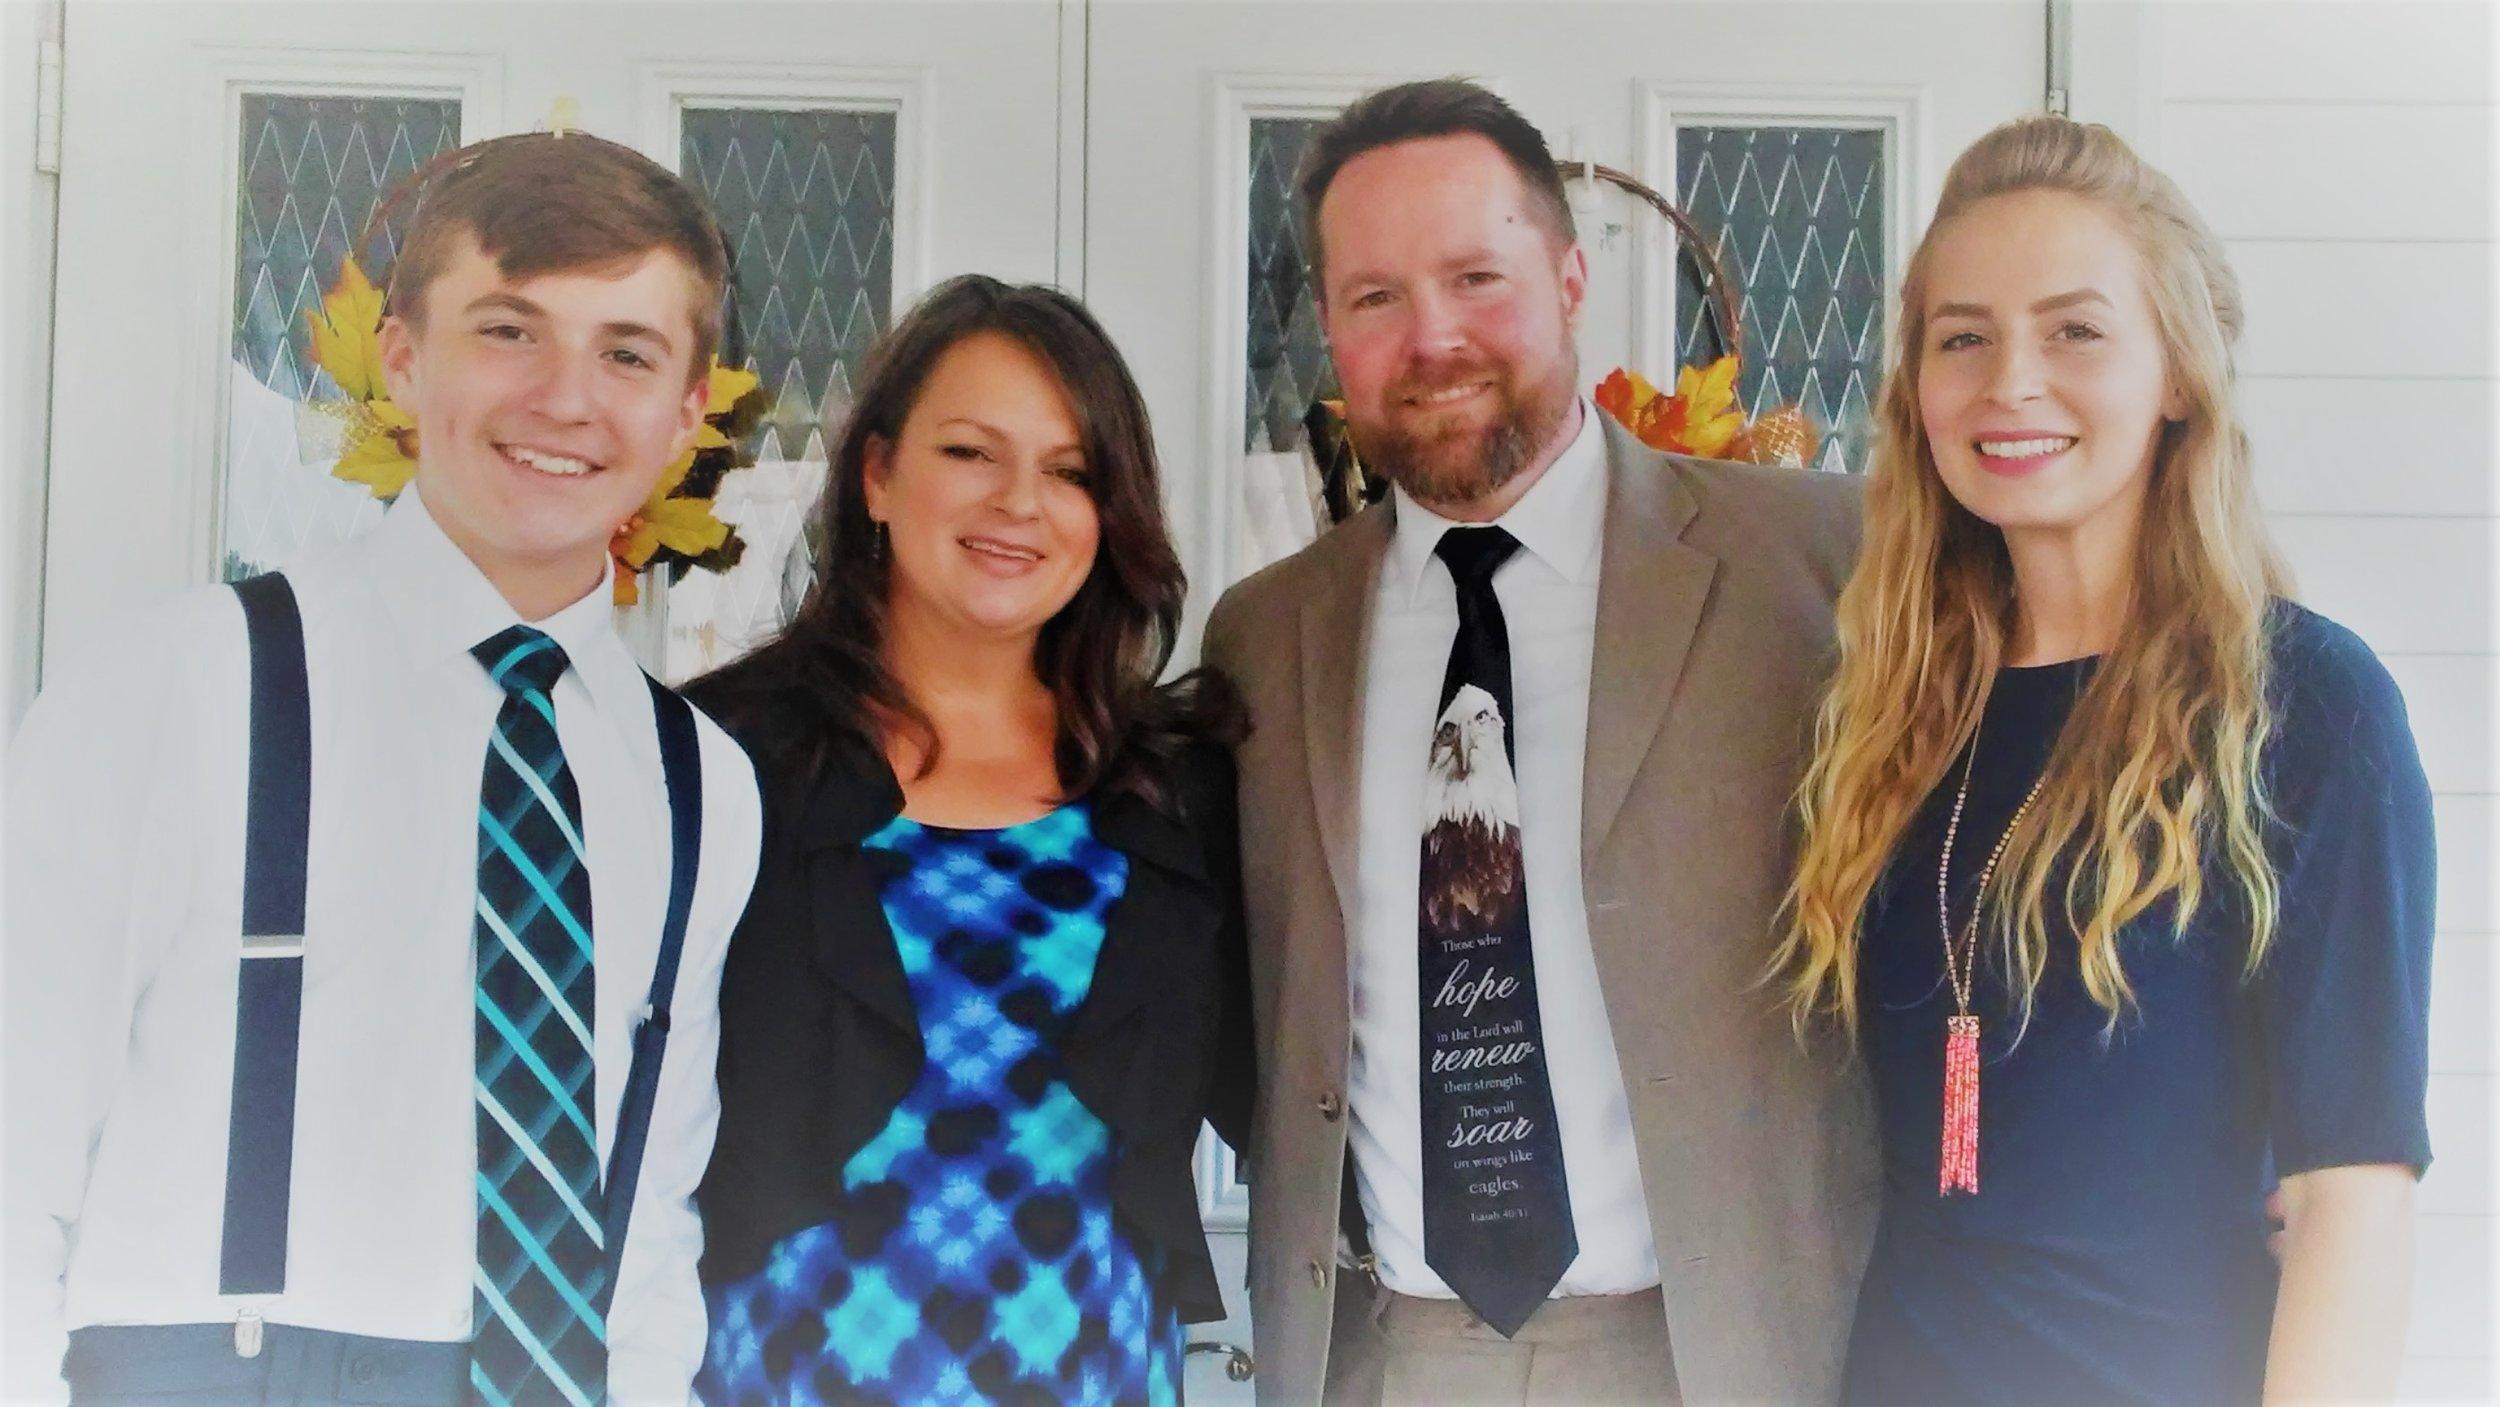 - Pastor Scott & Mrs. Deana w/ children Kayla & Scottie